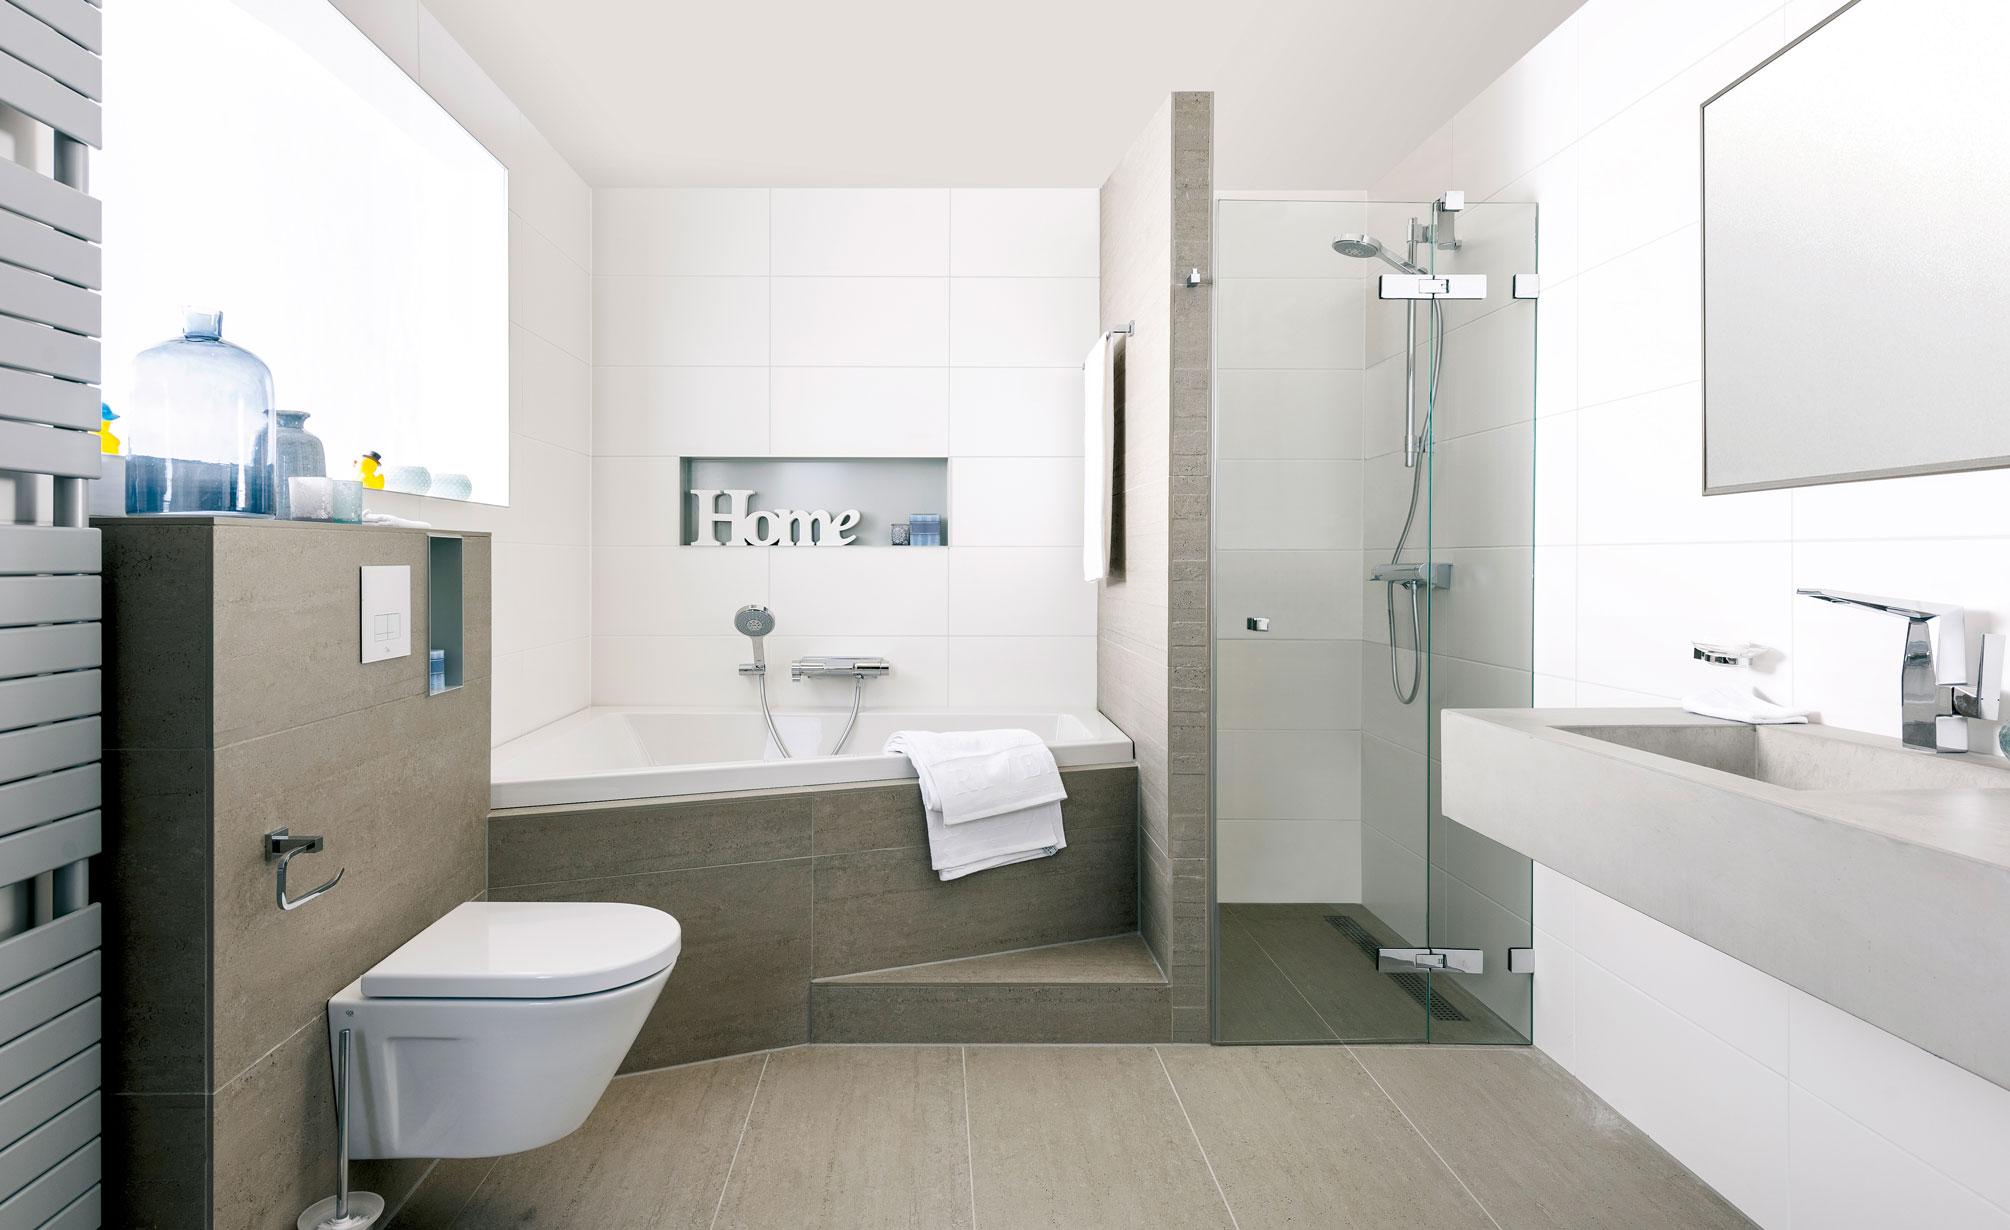 Badkamer Tegels Kalk : Matte tegels badkamer thomas gaspersz